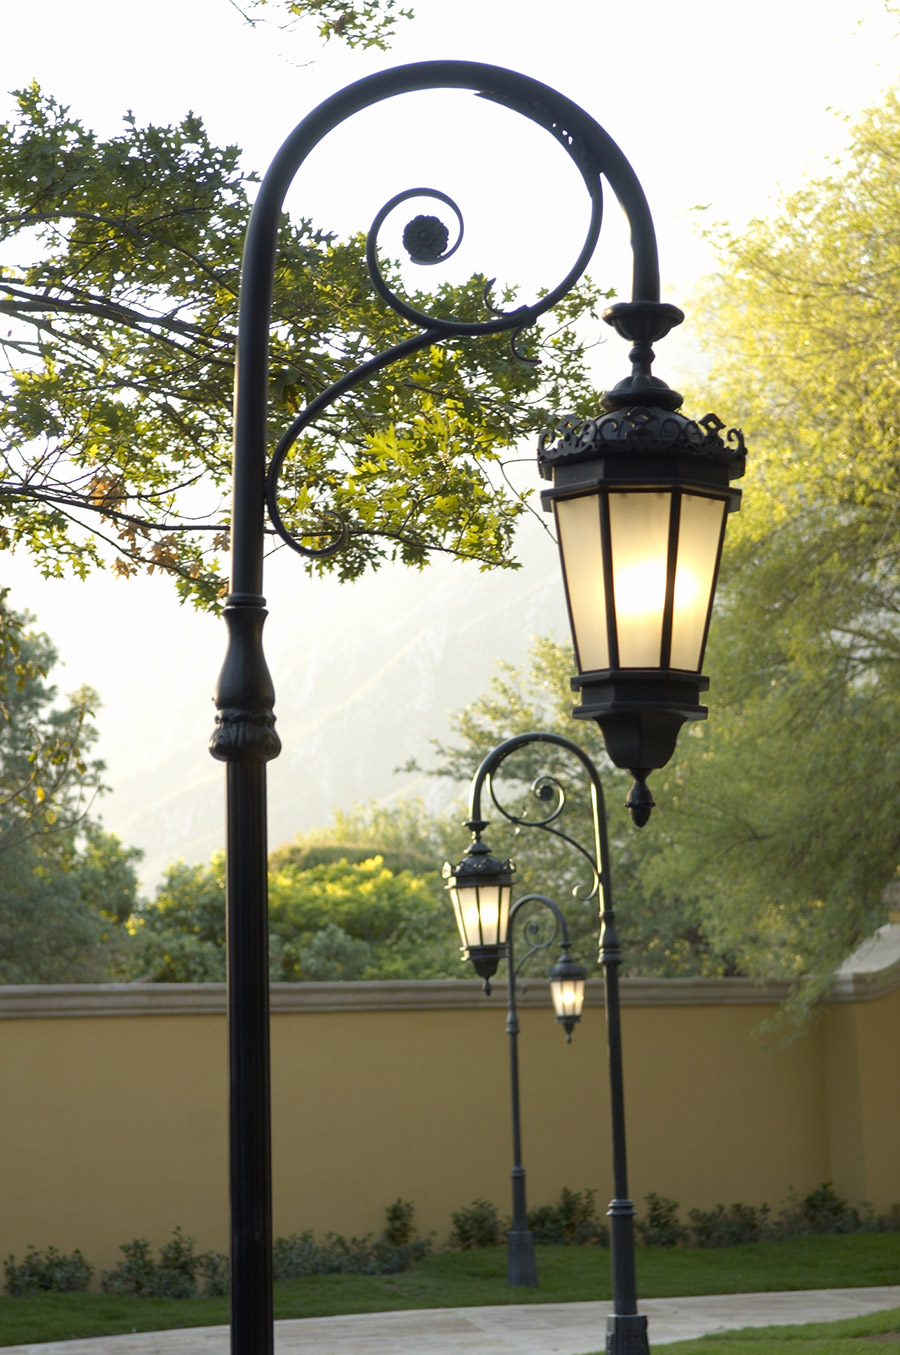 Chianti-OLS-CLA-E-003-classic--outdoor-Steel-Lighting-Post-Santa-Barbara-Residence-(35)